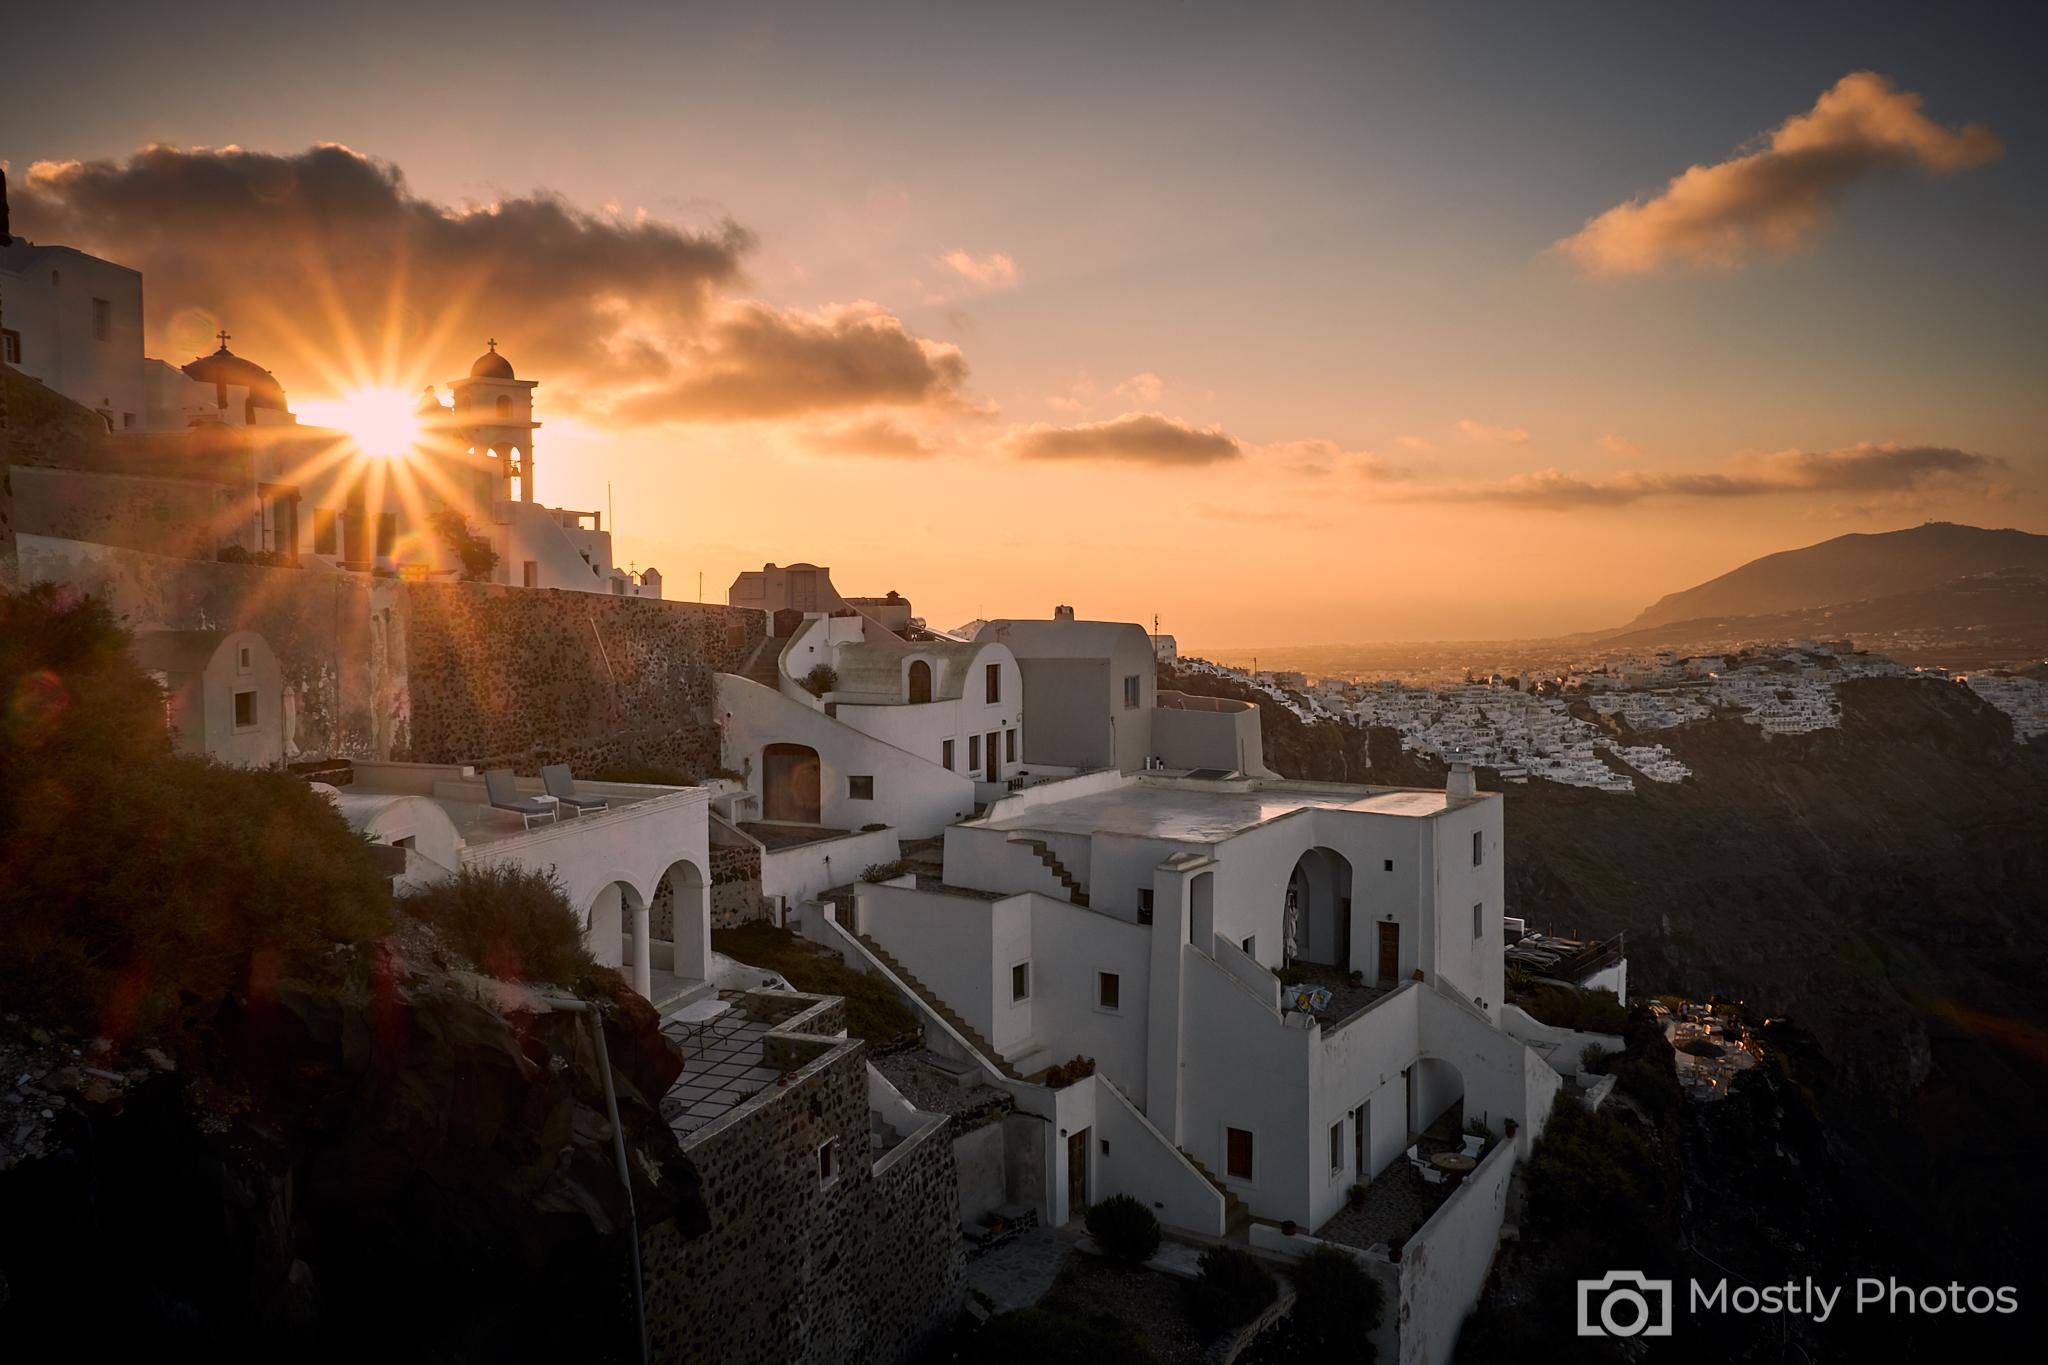 Dawn Light over Santorini, Greece Fuji X-T3 and Fuji 10-24mm